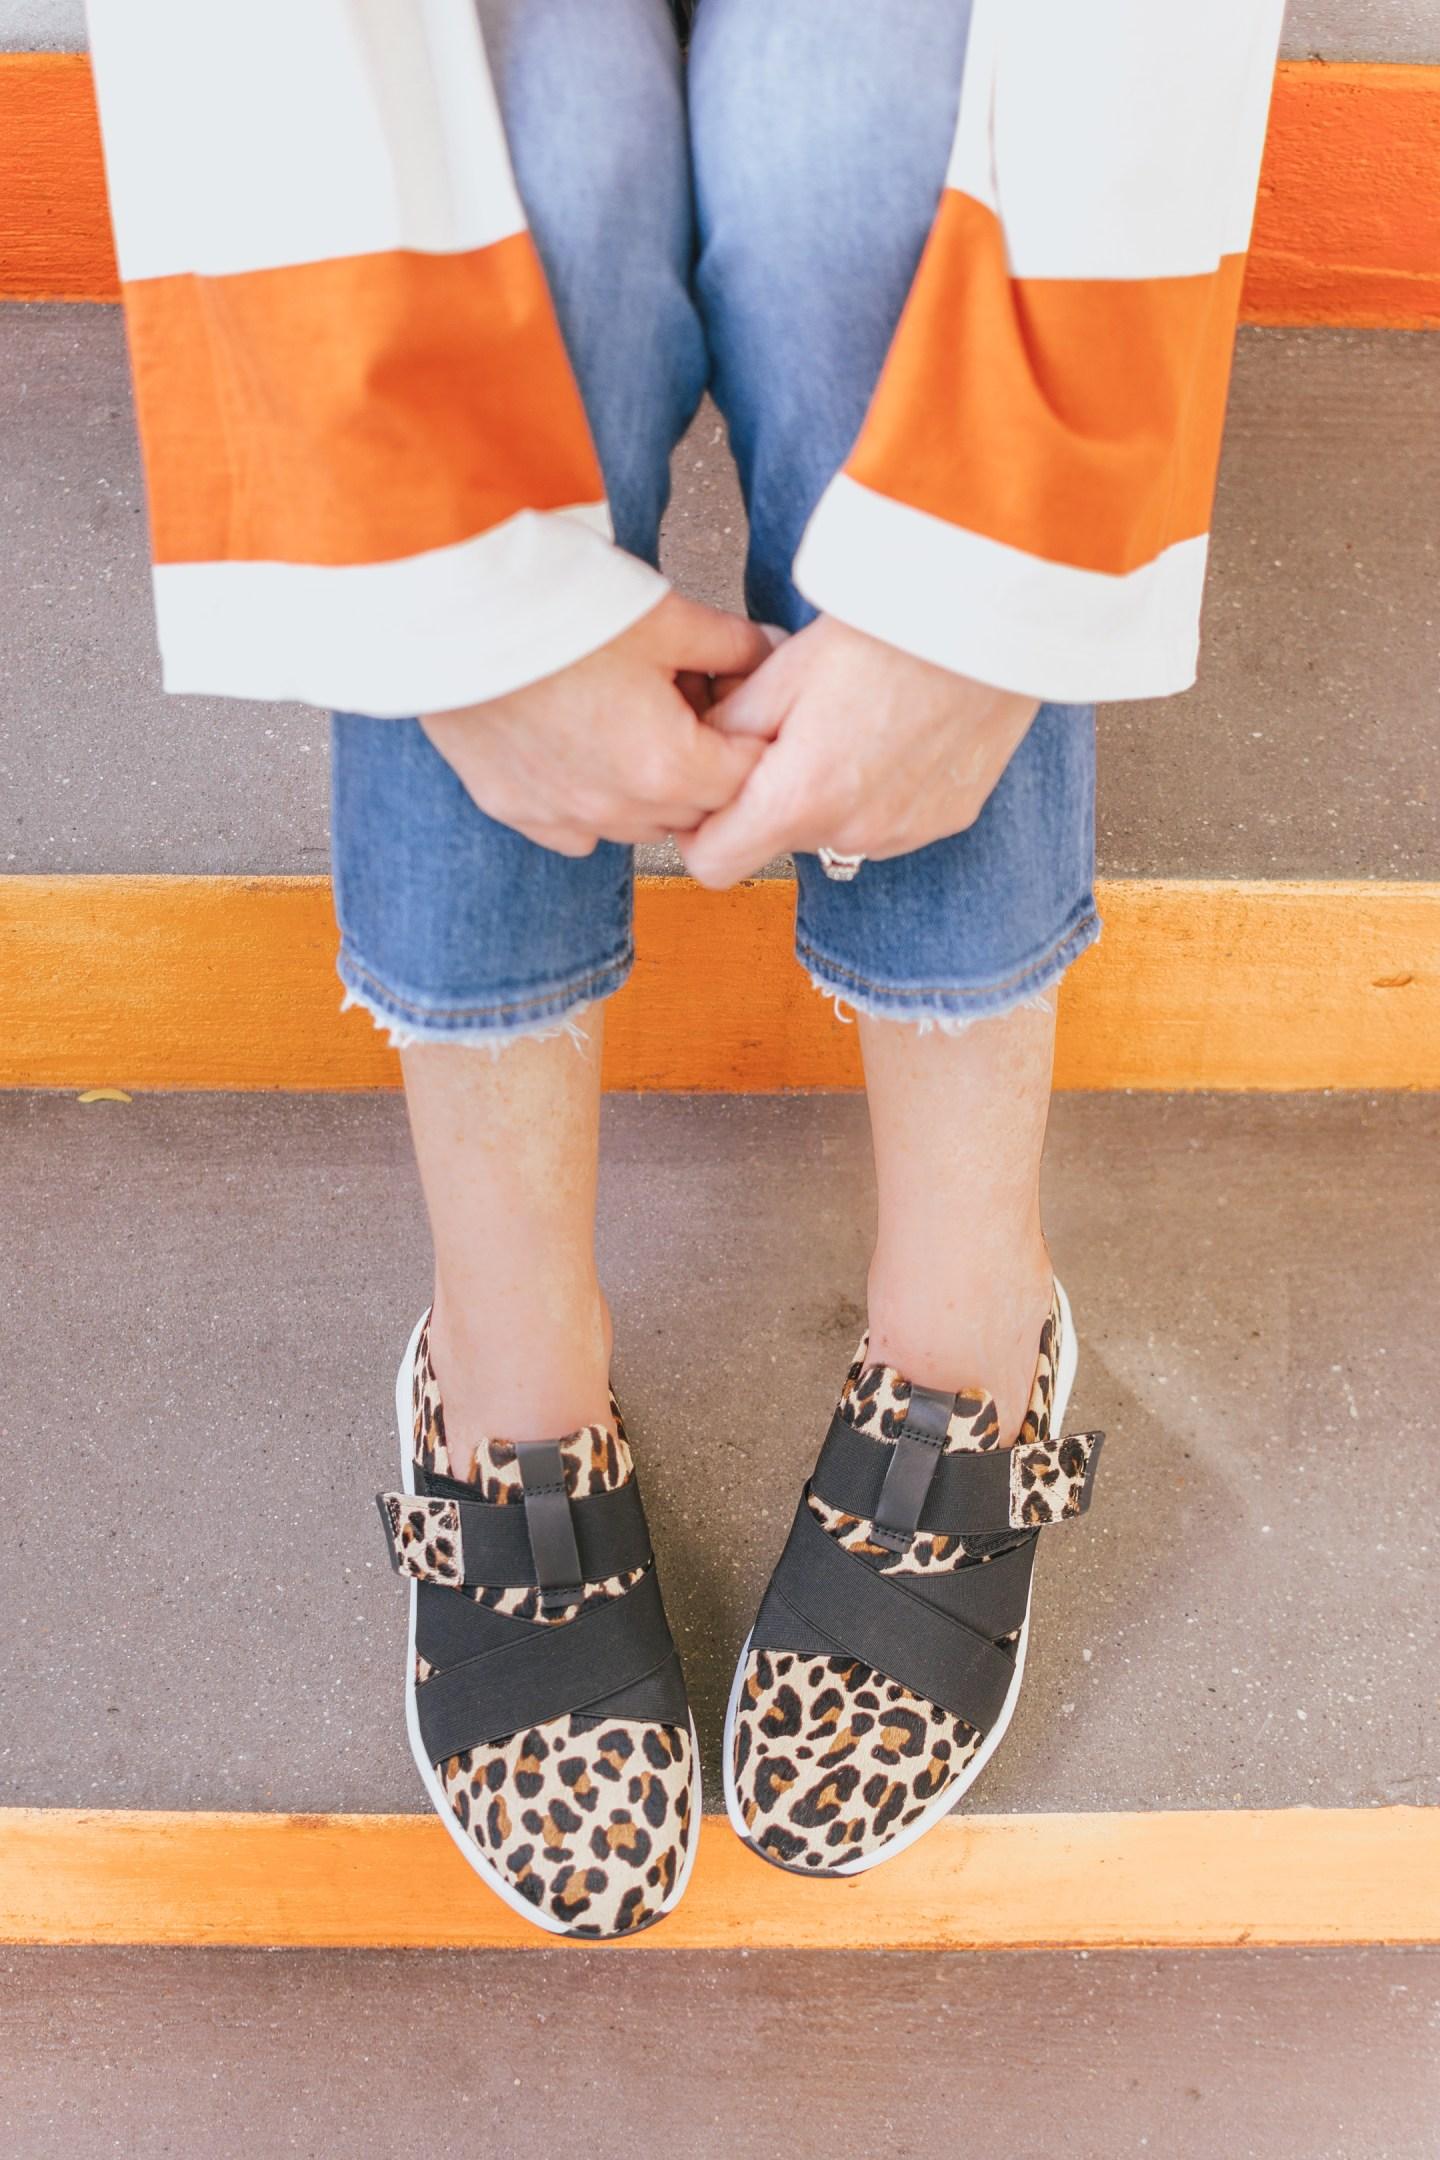 Zappos, Clarks Un Rio strap, leopard sneakers, how to incorporate leopard print into your wardrobe